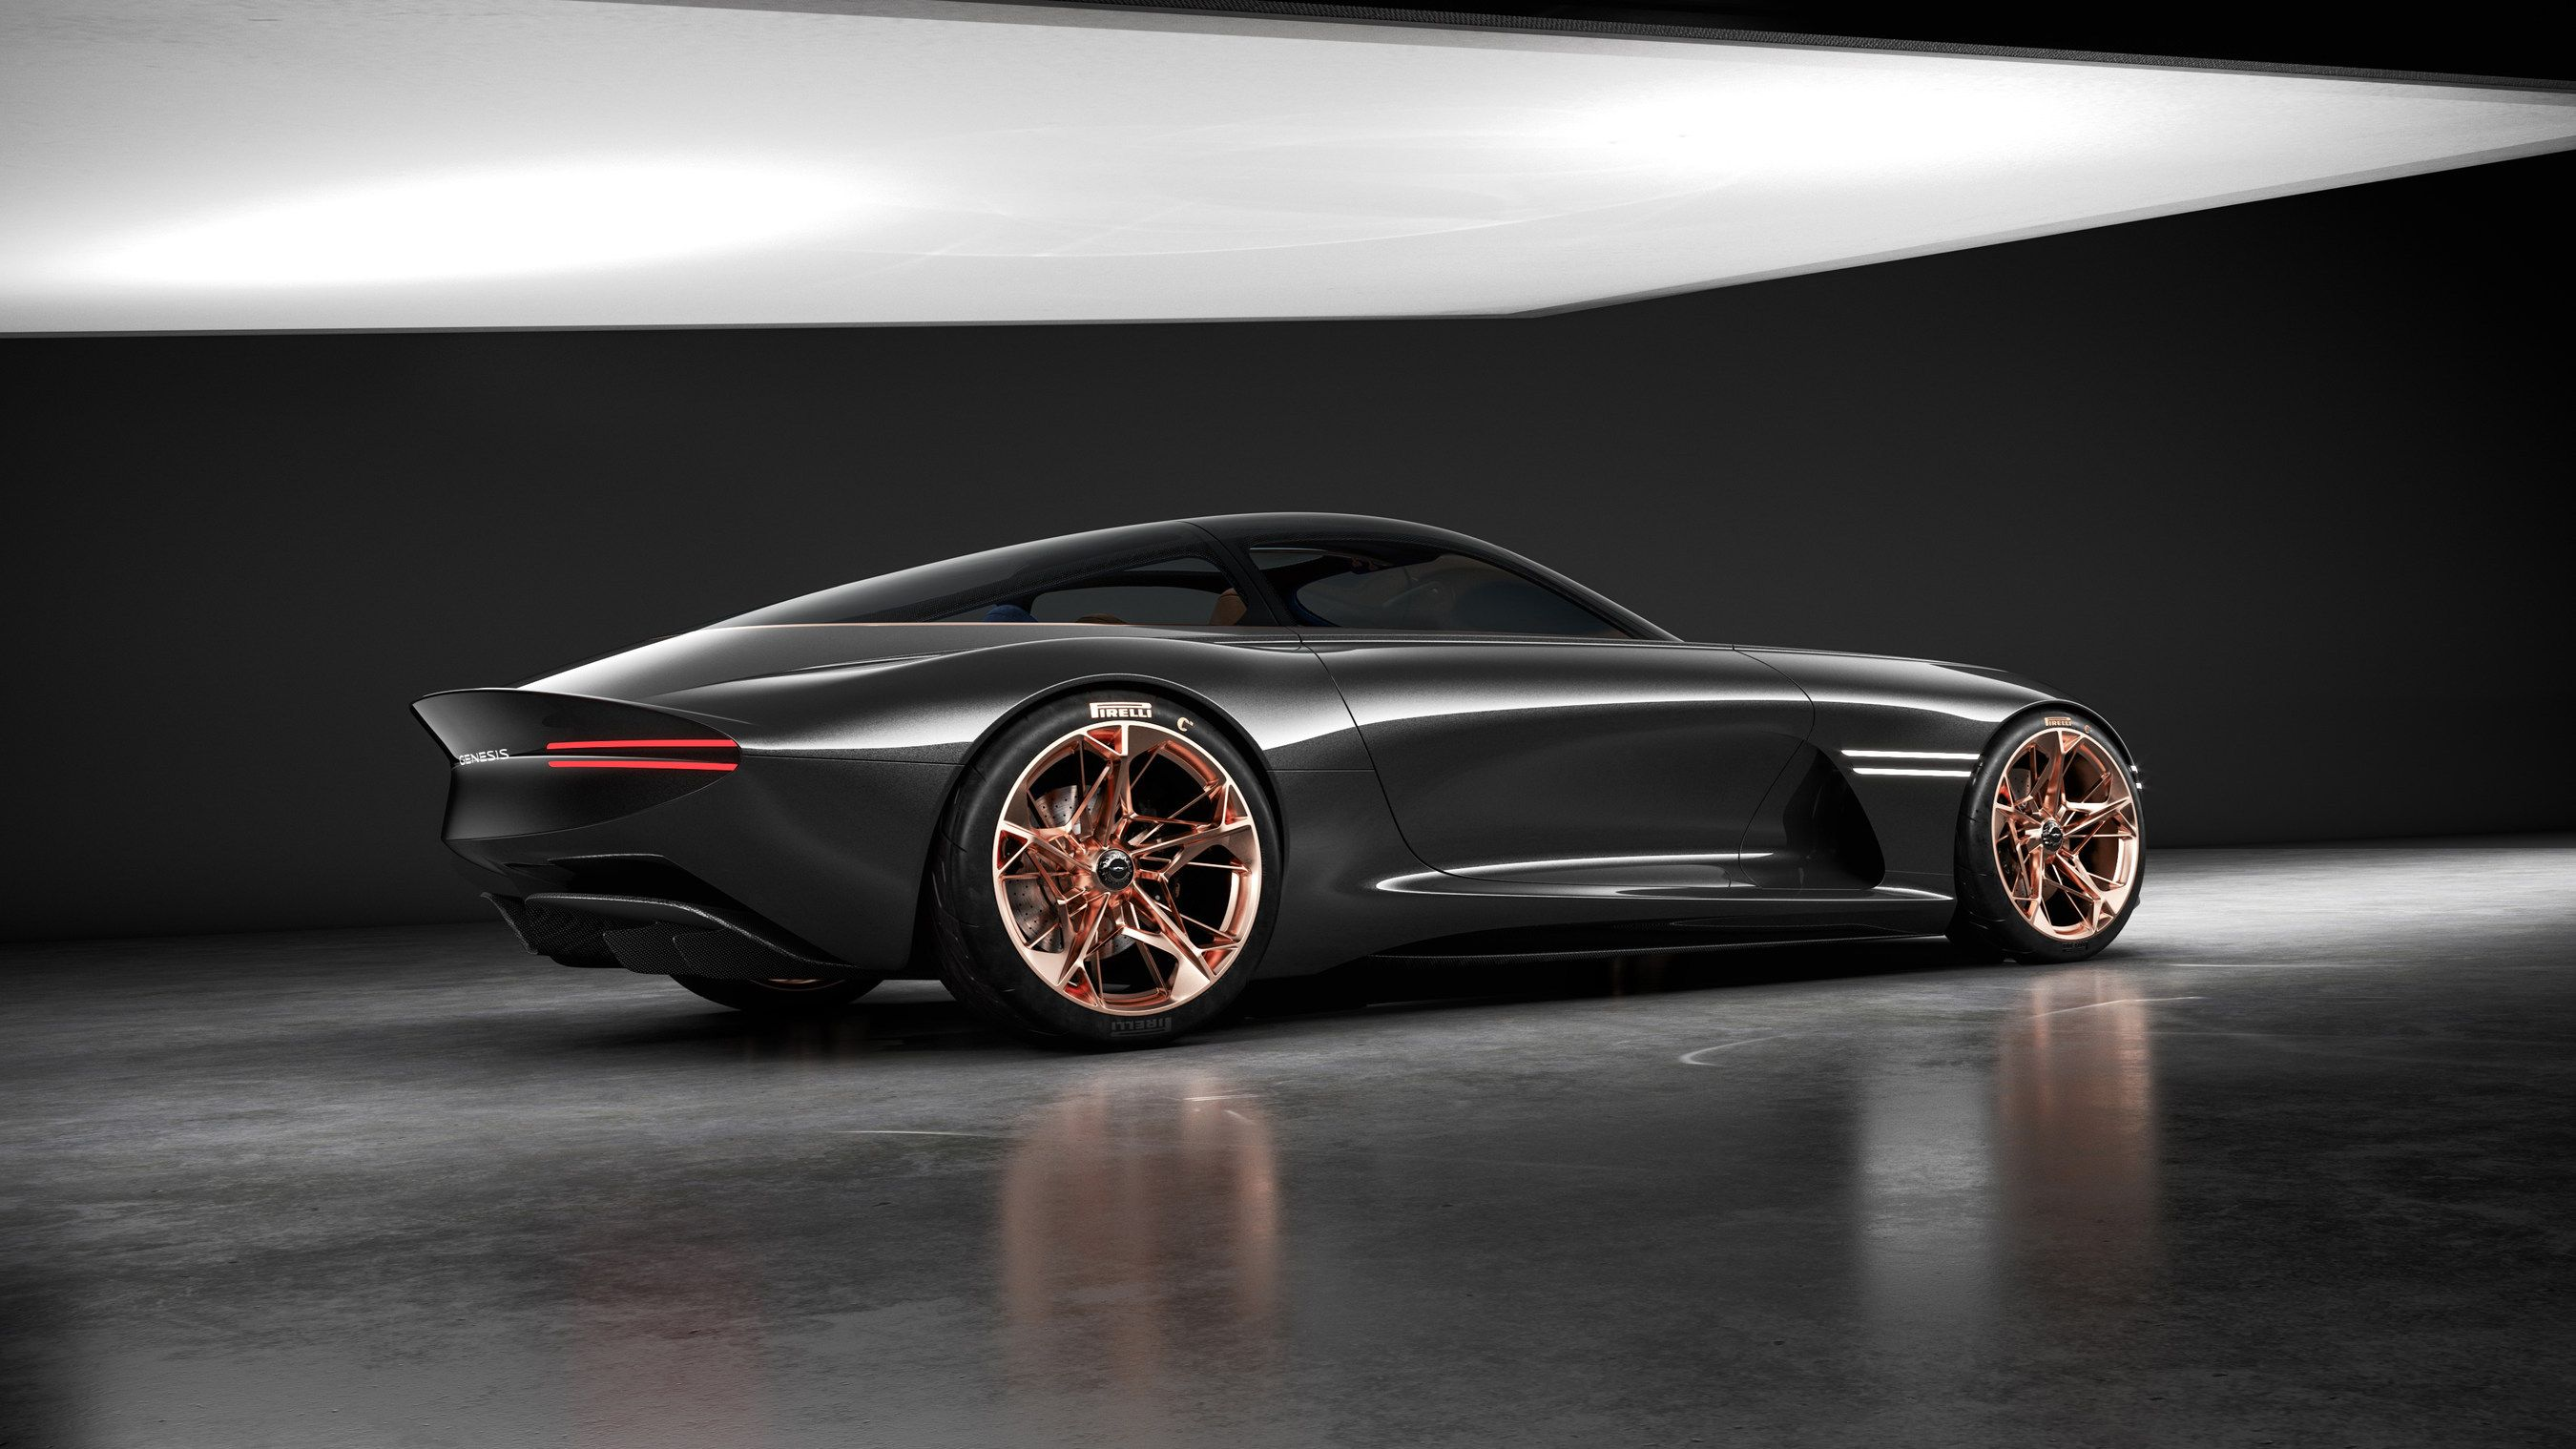 Genesis unveiled their luxury electric car 'Essentia